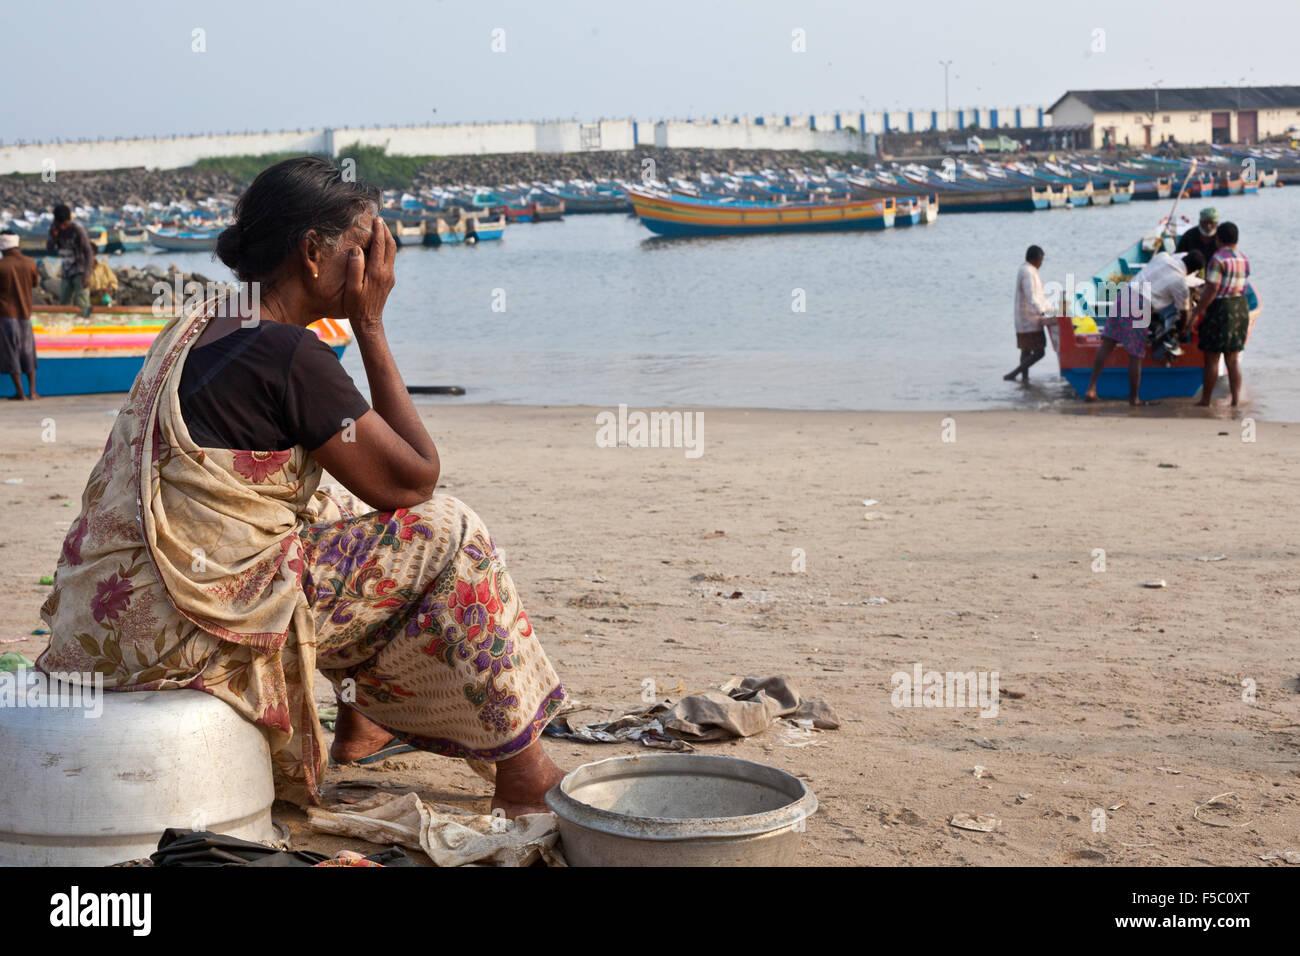 Vizhinjam Christian fisherman village in Kerala, India, November 2014. Women wait for fisherman boats. - Stock Image